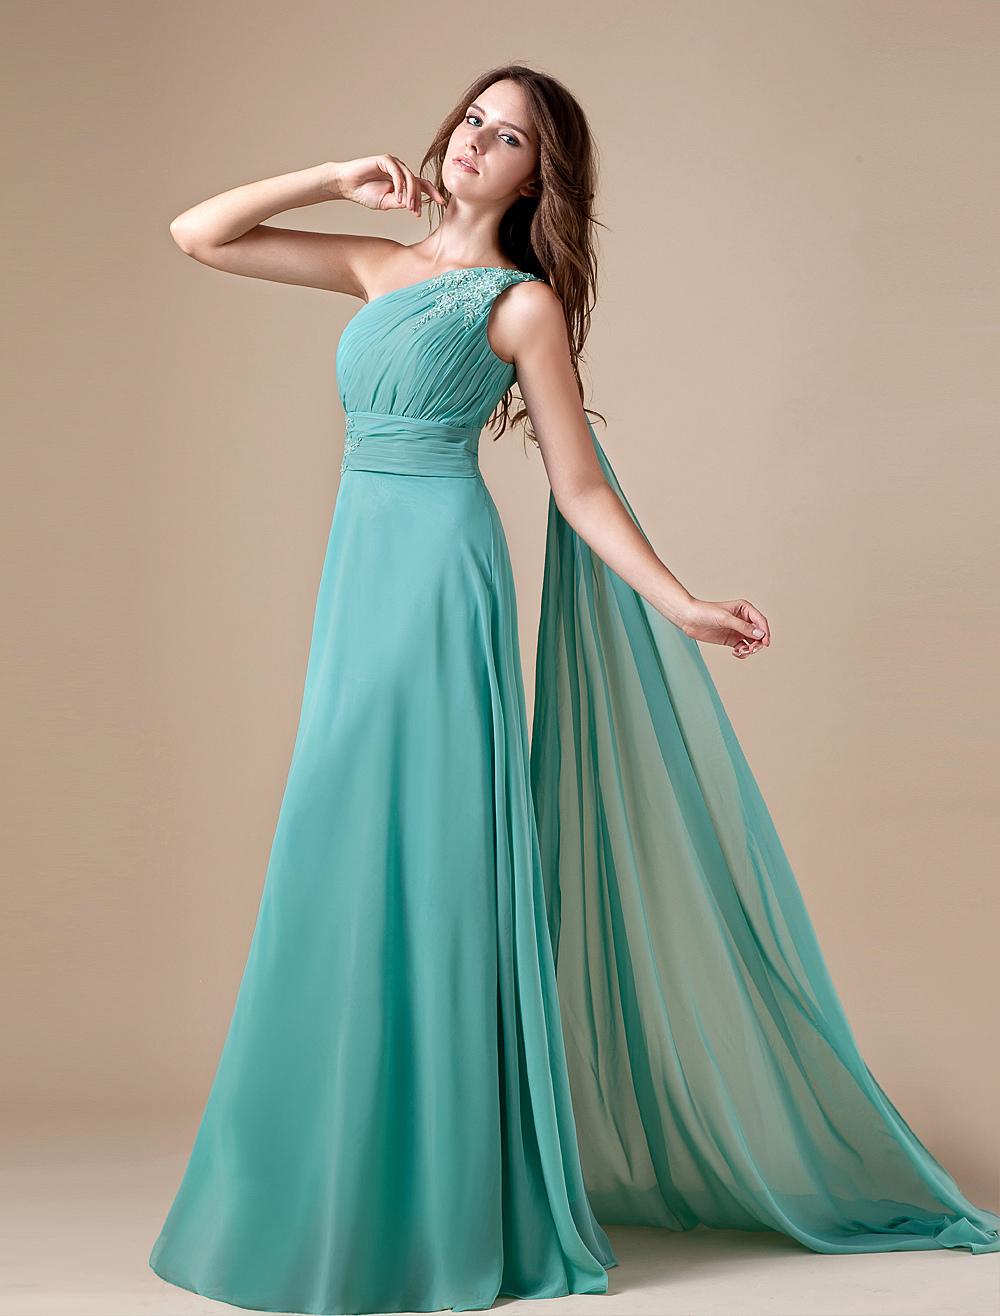 Turquoise Chiffon One Shoulder Prom Dress (Wedding Prom Dresses) photo